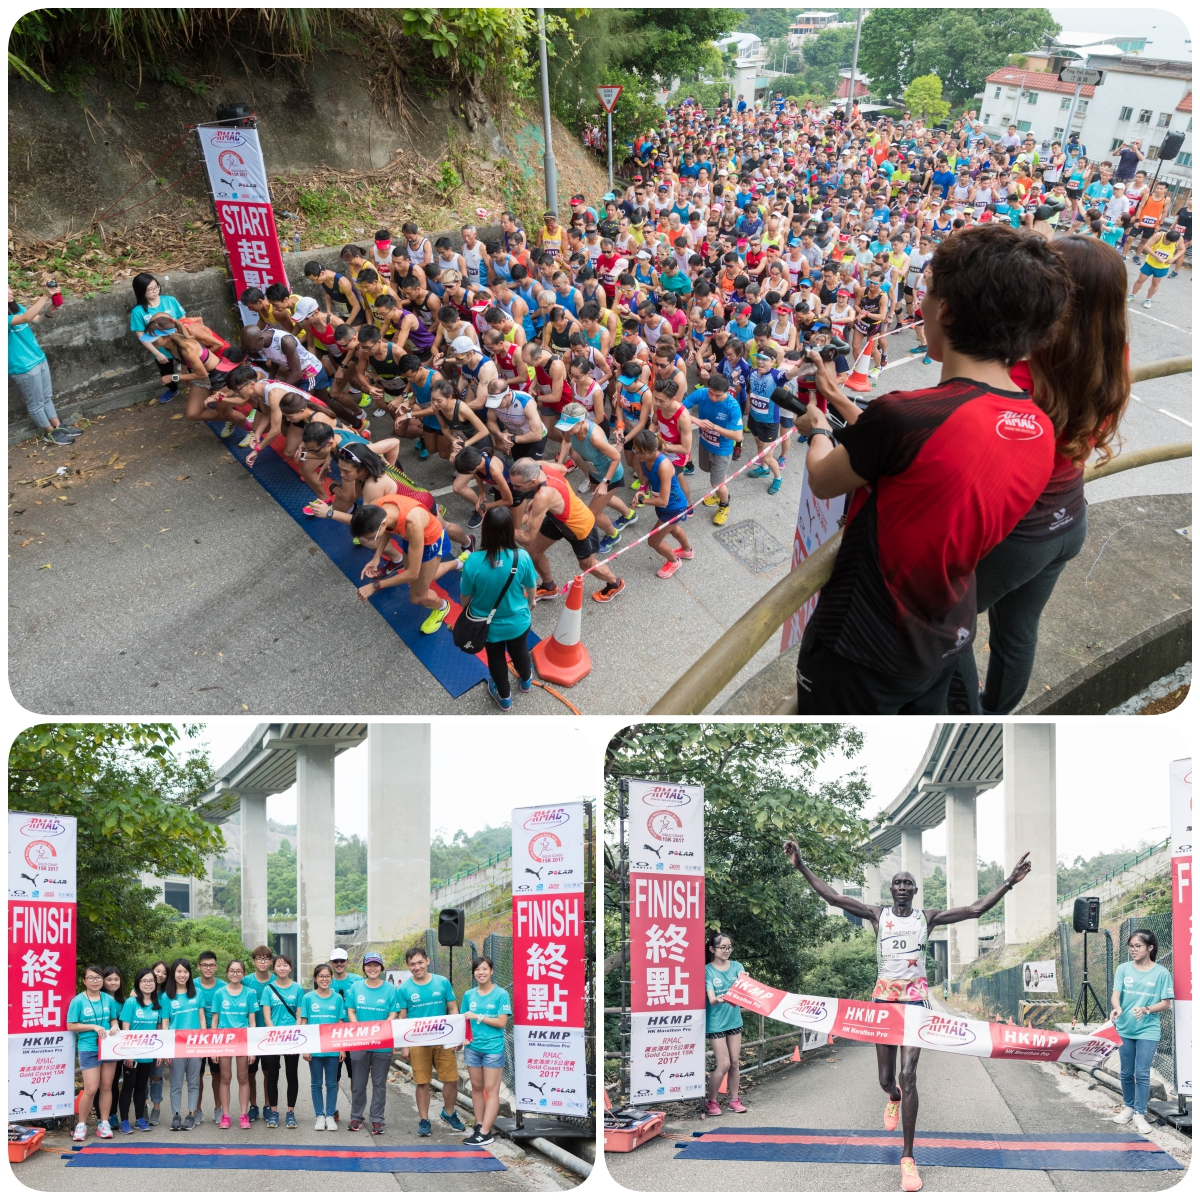 RMAC黃金海岸15公里賽2017圓滿舉行 - 由本會冠名贊助,香港馬拉松推廣社主辦的RMAC黃金海岸15公里2017於本月12日於汀九引水道進行,逾700位跑手參賽,本會參賽同學佔了當中約100名。當日天氣清涼,略為潮濕,但仍無阻跑手造出好成績。最終由肯亞跑手Benard Kiplangat Kibilo以50分09秒打破大會紀錄,並成功奪冠。女子組方面,則由本地跑手范倩怡以1小時07分06封后。